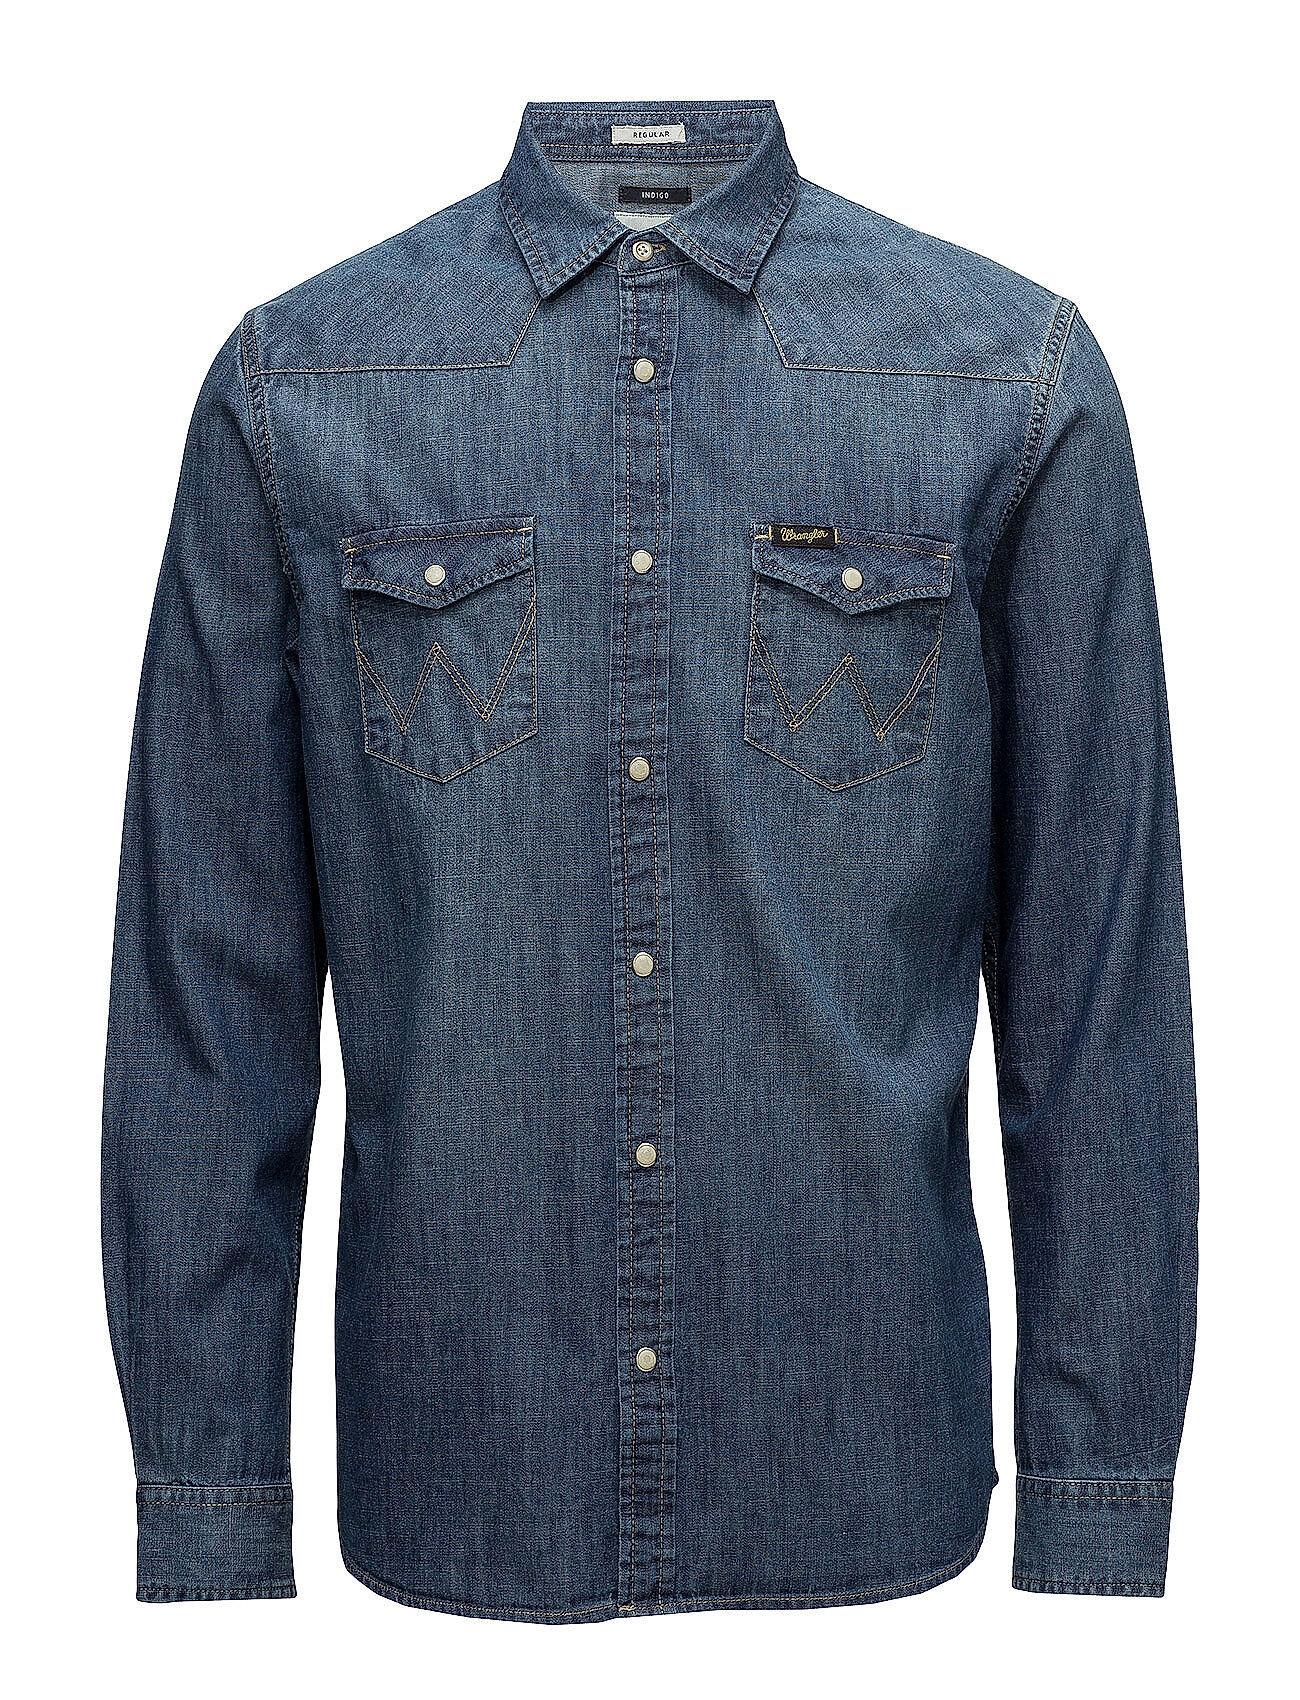 Wrangler Western Denim Shirt